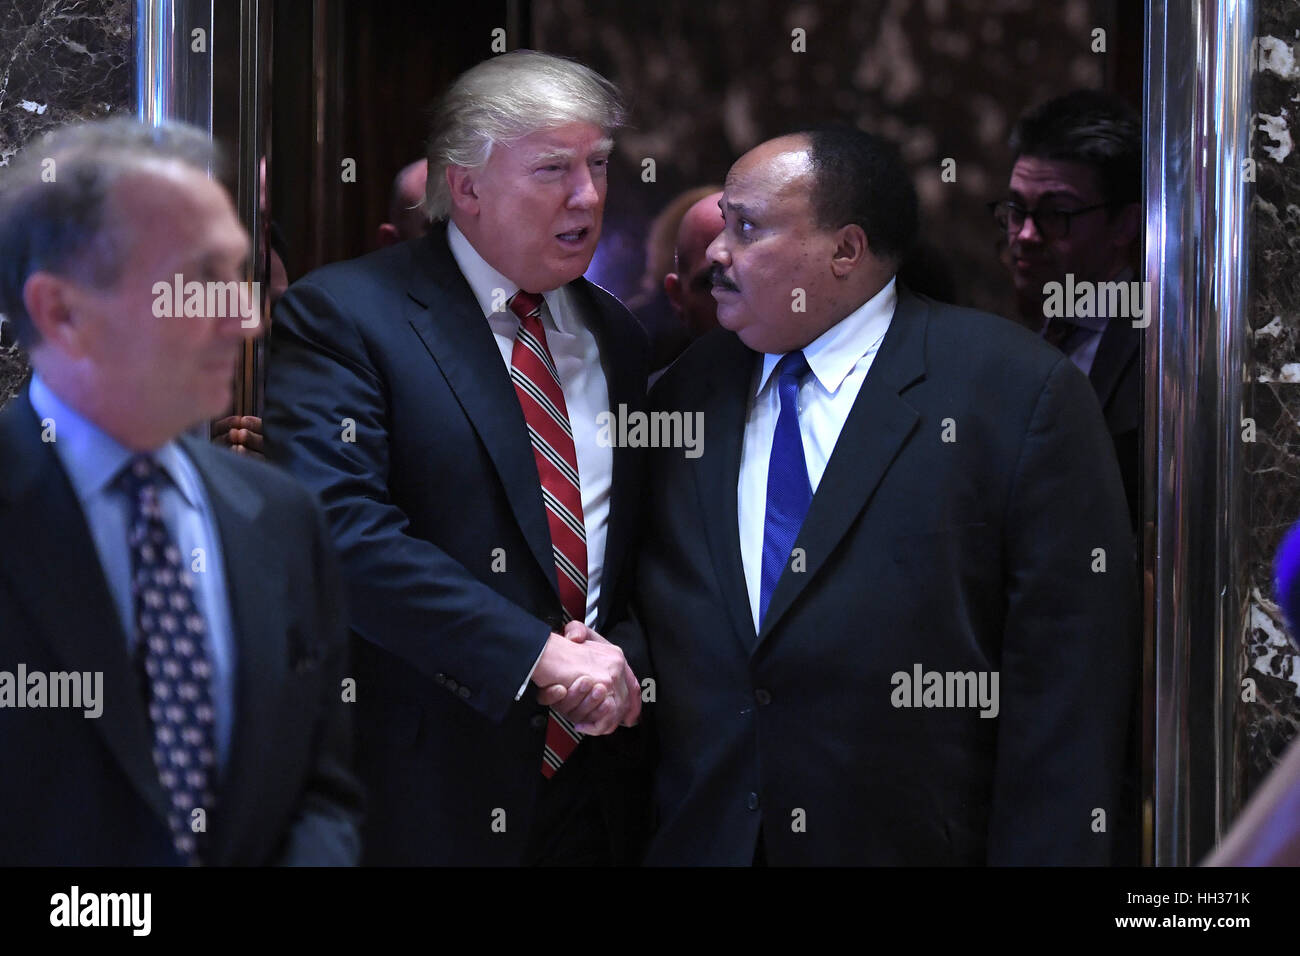 New York, USA. 16 janvier, 2017. Président désigné Donald J. Trump, serre la main avec Martin Luther Photo Stock